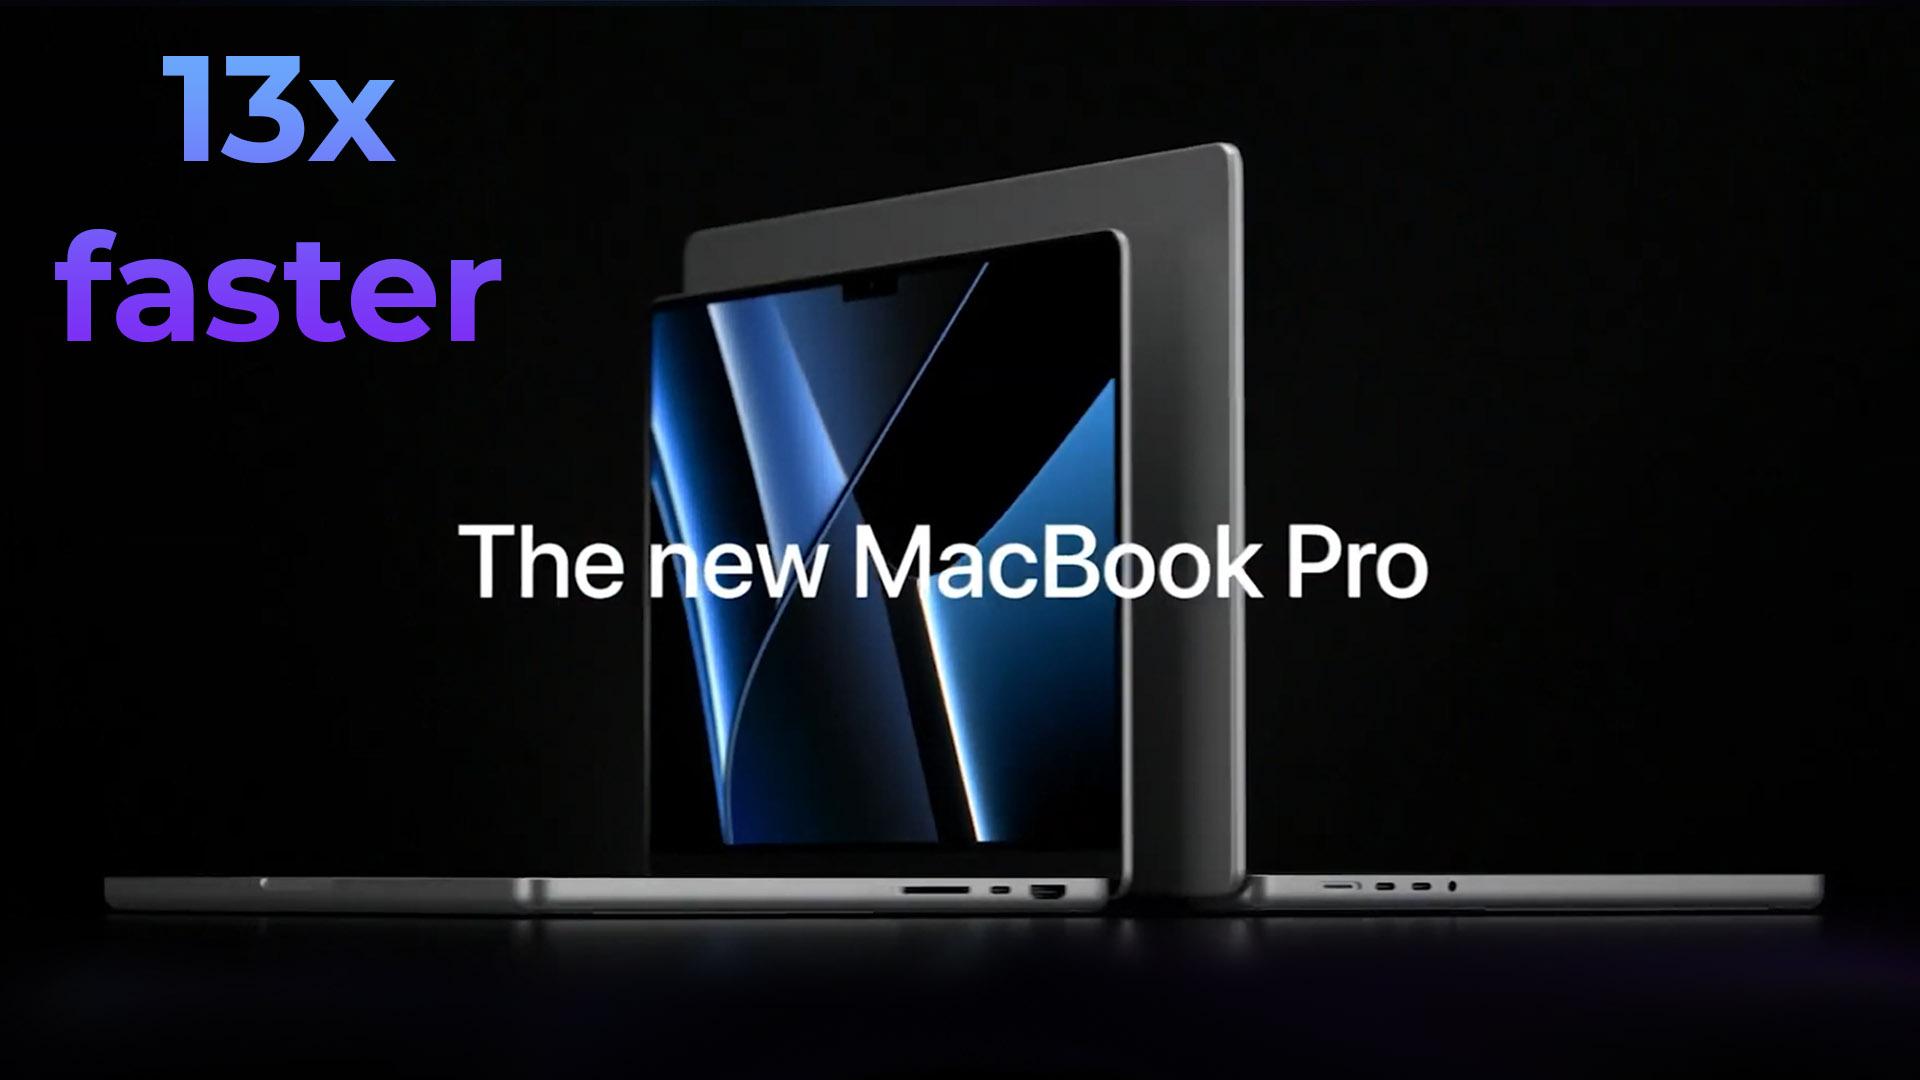 Best MacBook Pro for Video Editor